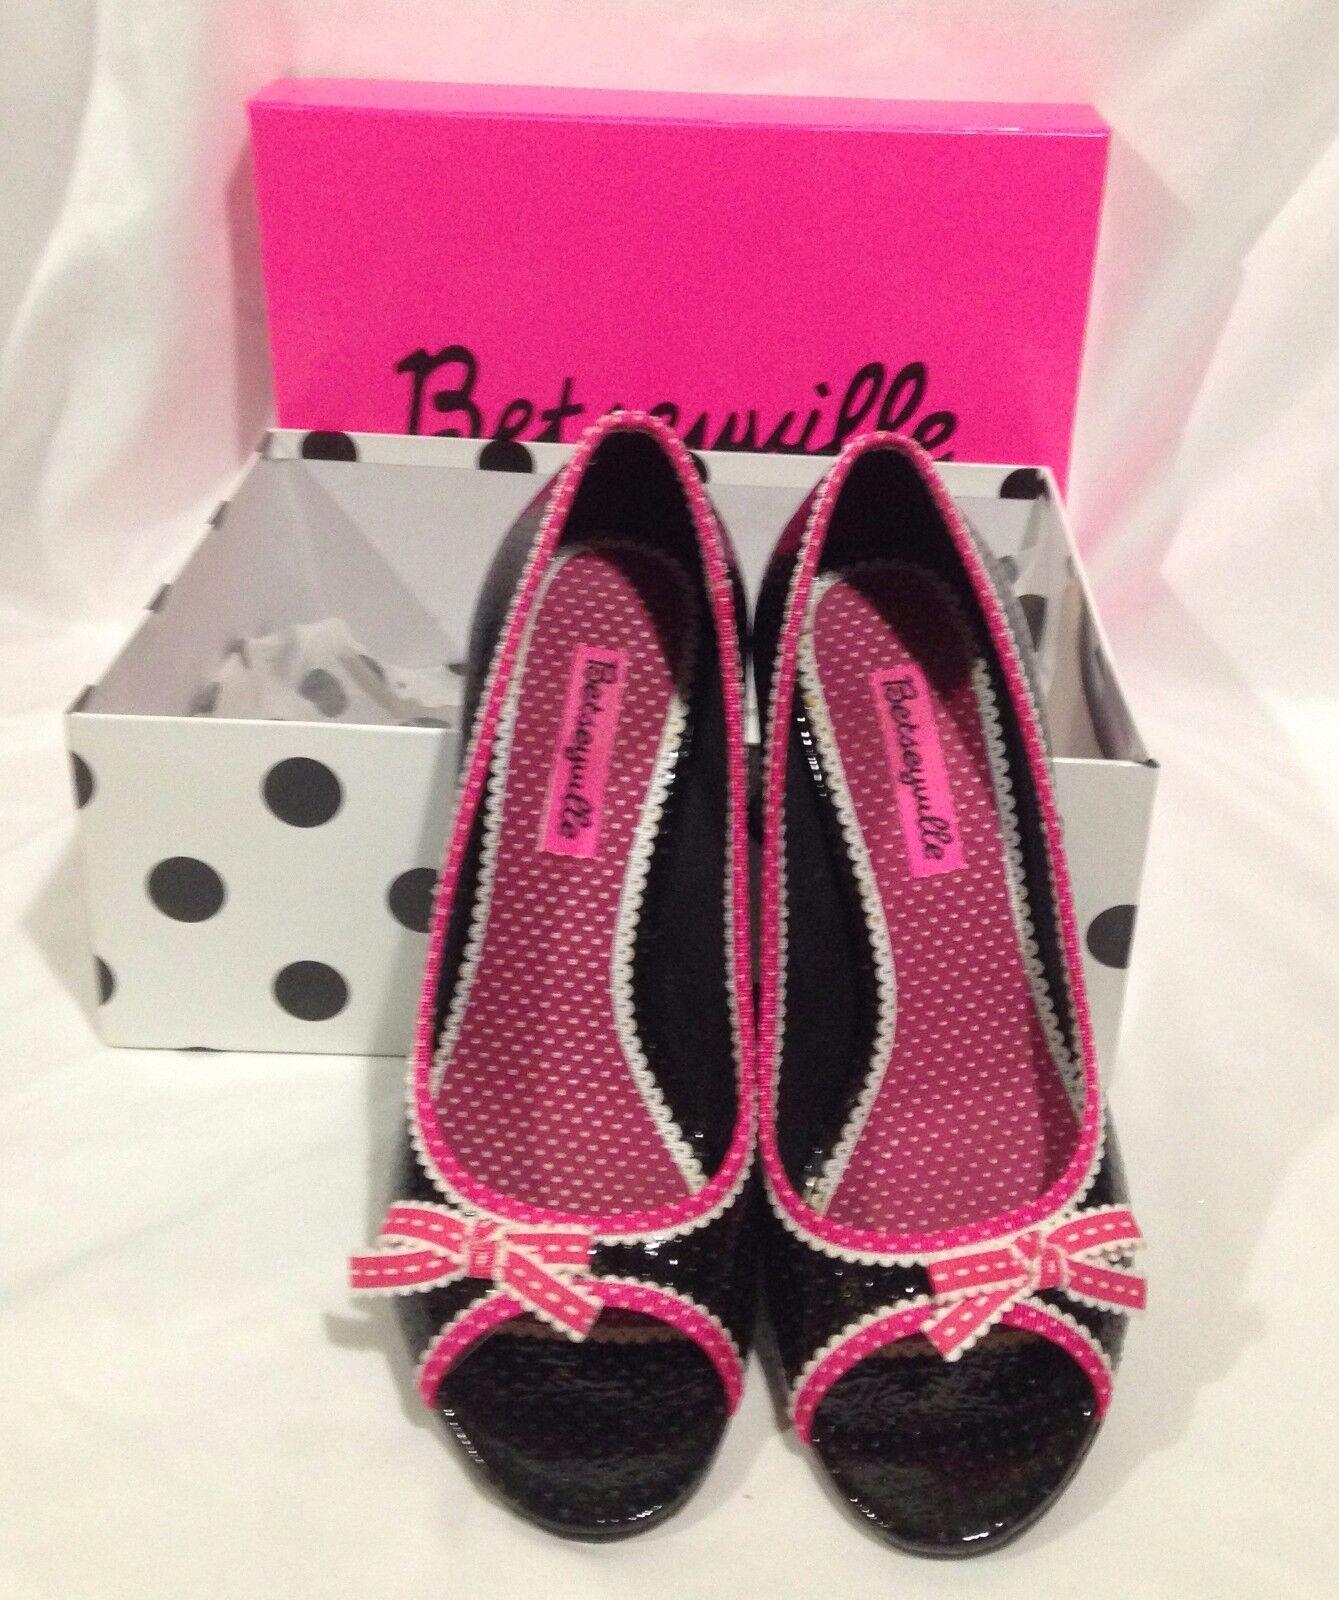 Betsyville Size 6.5 Med Black   Pink Open Toe High Heel shoes Slight wear - Box